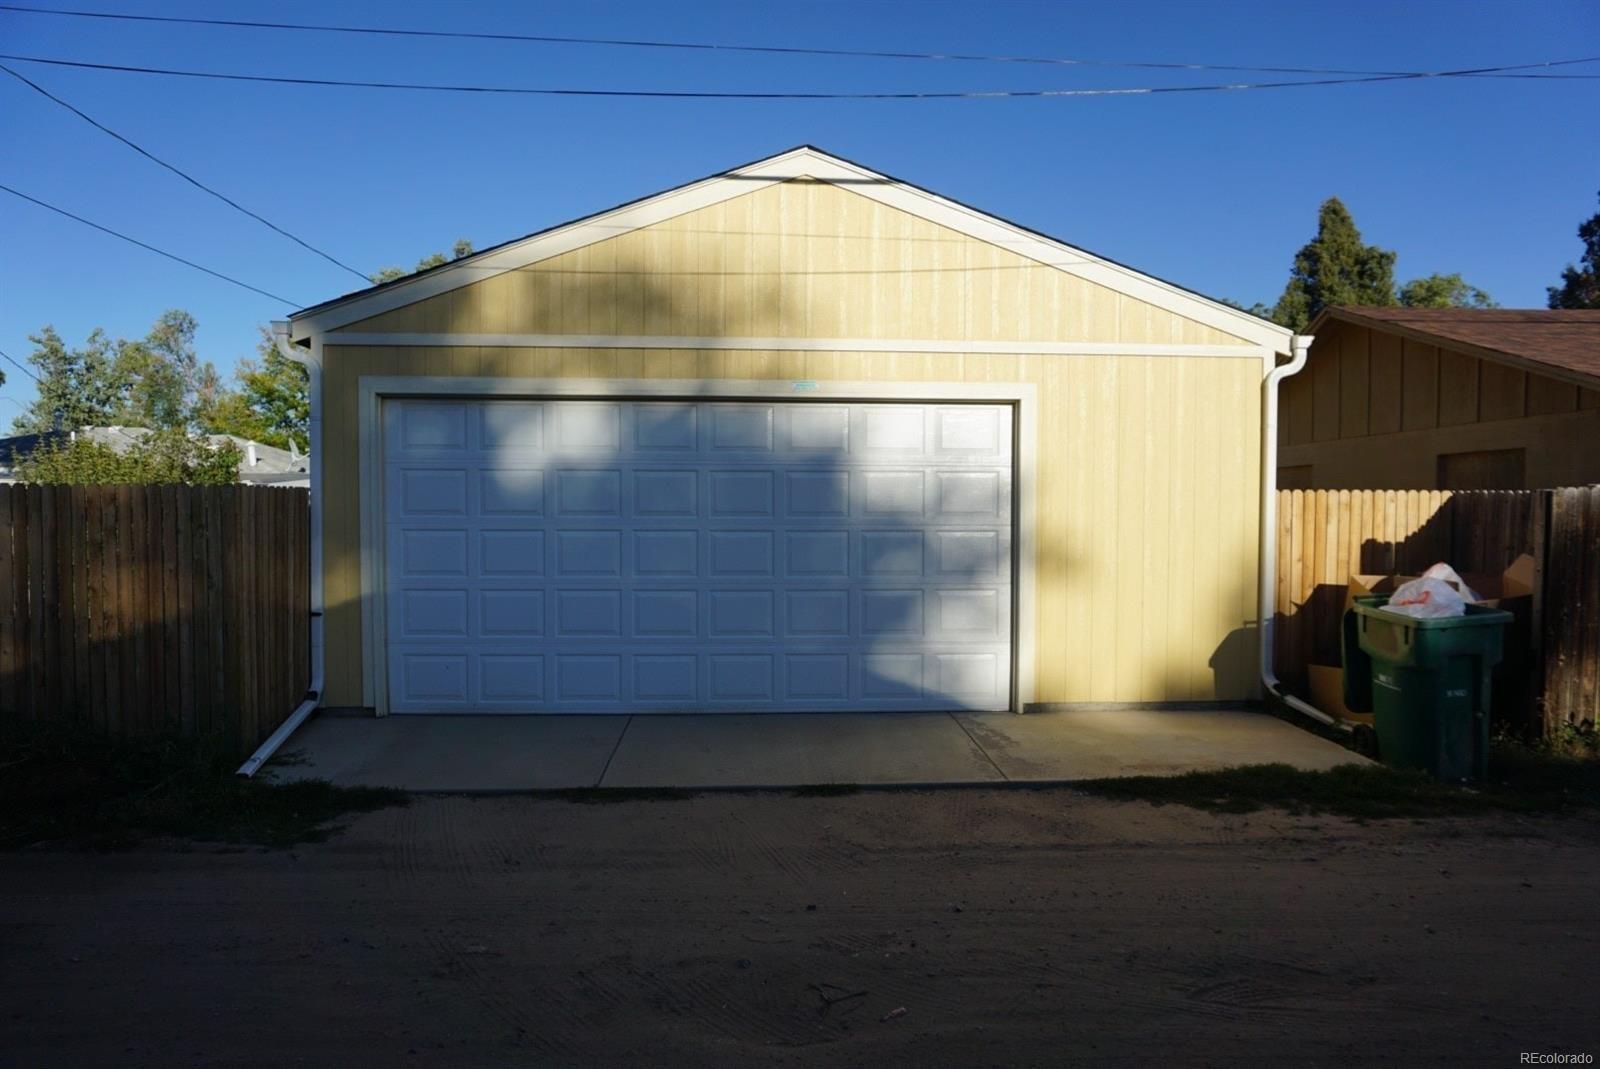 MLS# 9559127 - 4 - 4389 S Sherman Street, Englewood, CO 80113